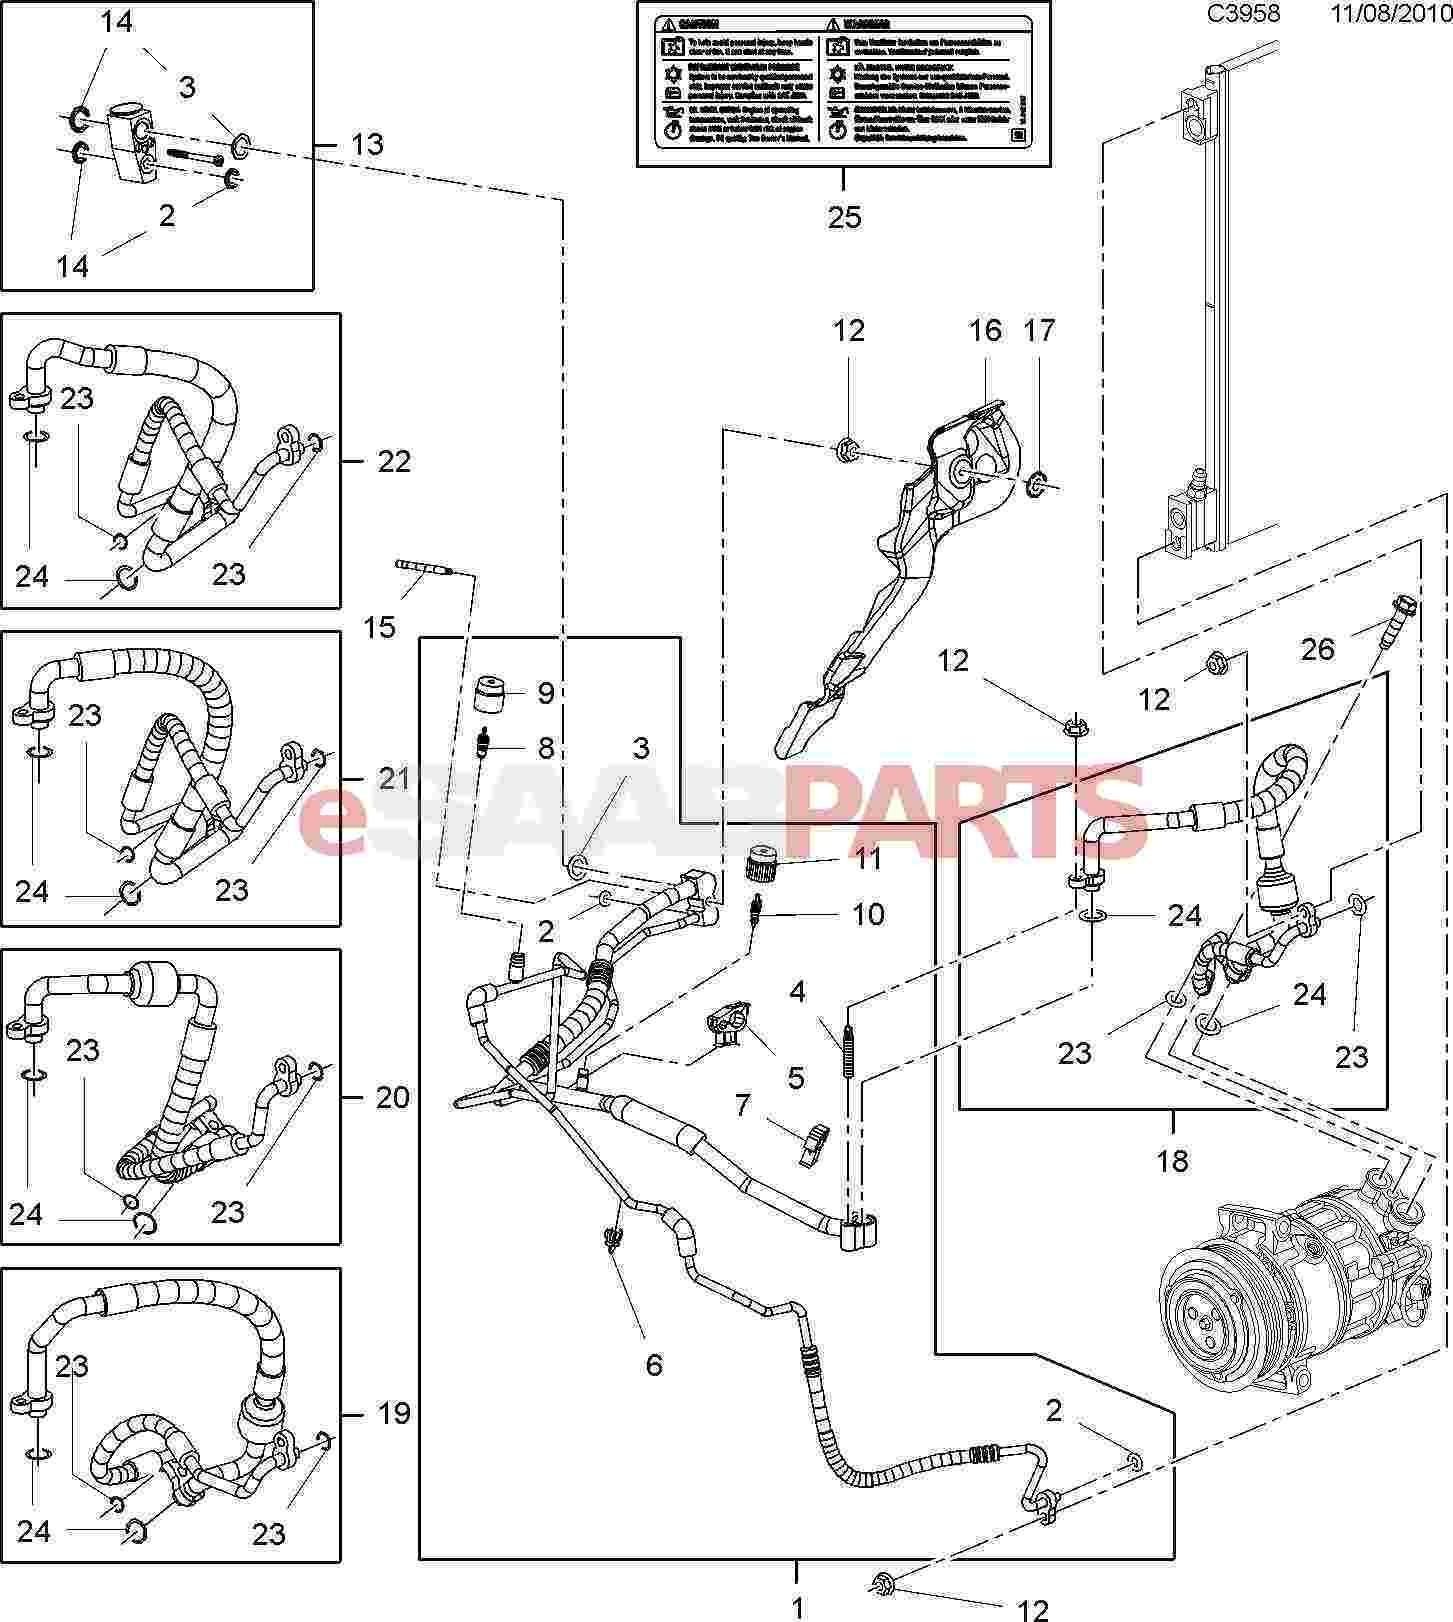 Auto Air Conditioning Parts Diagram ] Saab O Ring Genuine Saab Parts From Esaabparts Of Auto Air Conditioning Parts Diagram